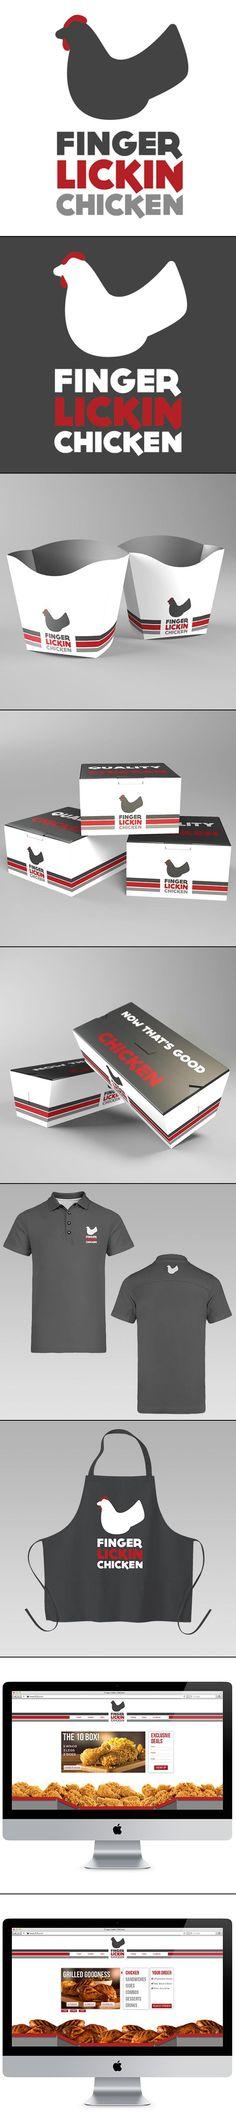 Finger Lickin Chicken Lunchtime #identity #packaging #branding #marketing PD